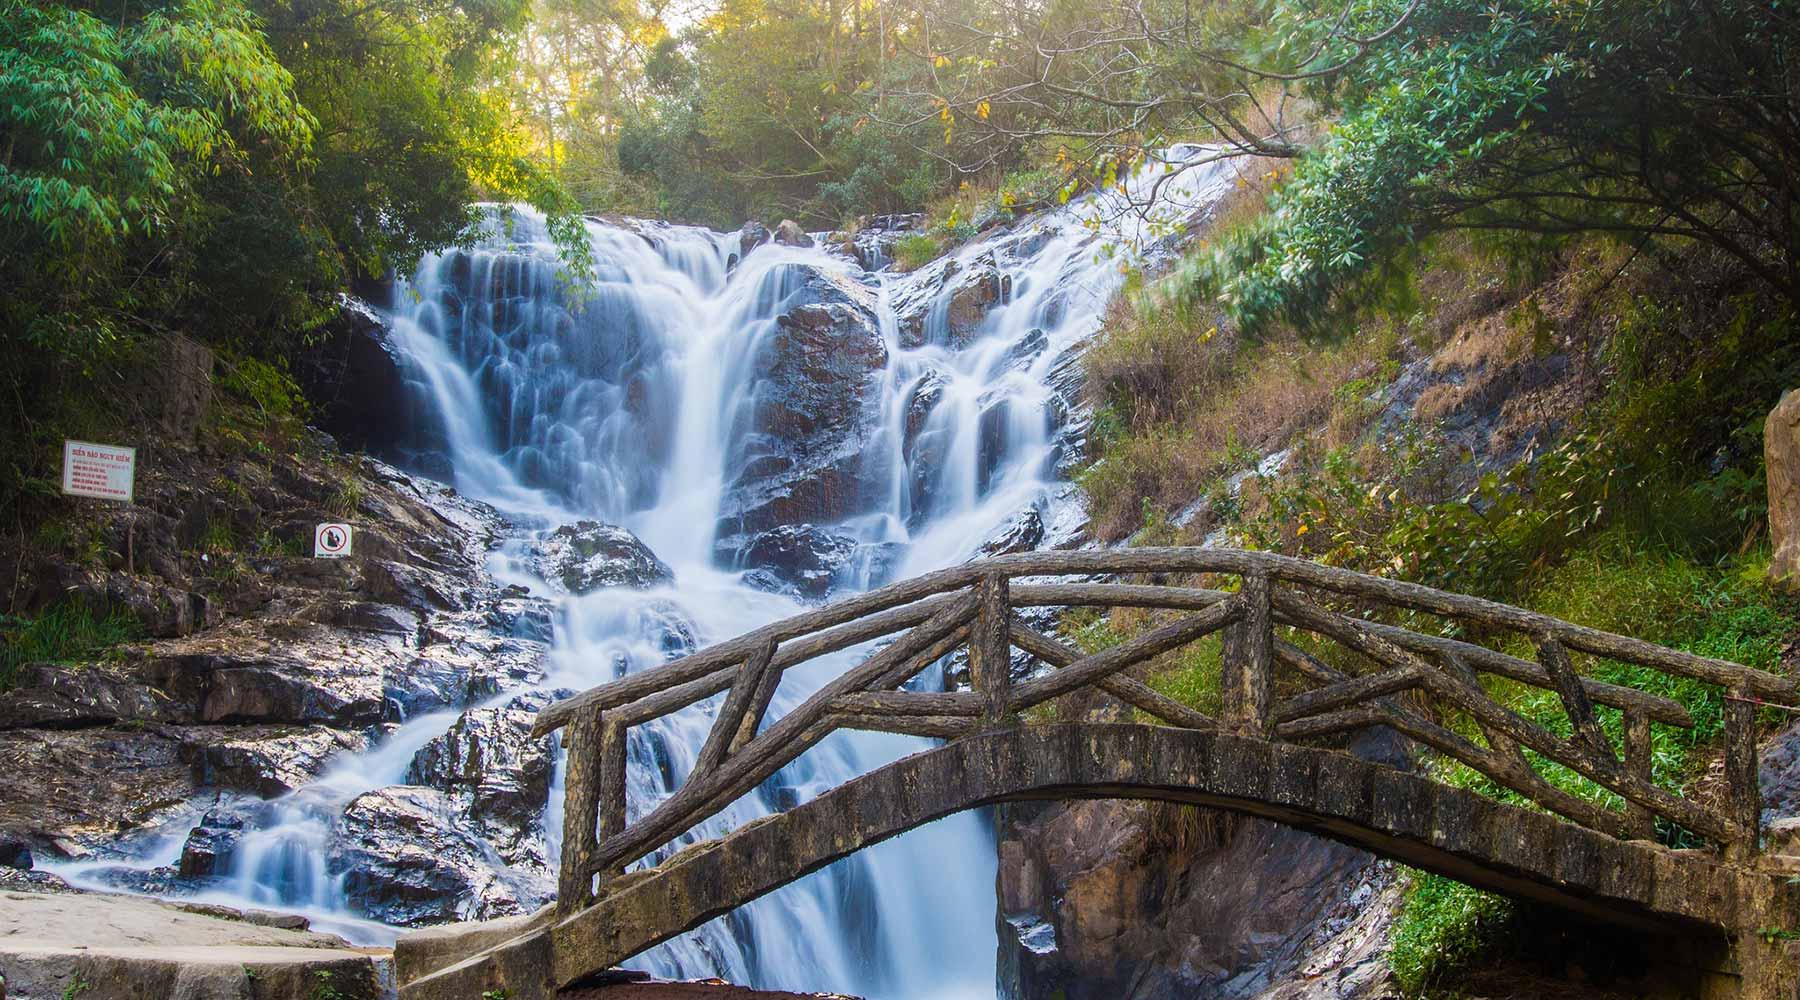 Datanla waterval in Dalat: canyoning, achtbaan en kabelbaan